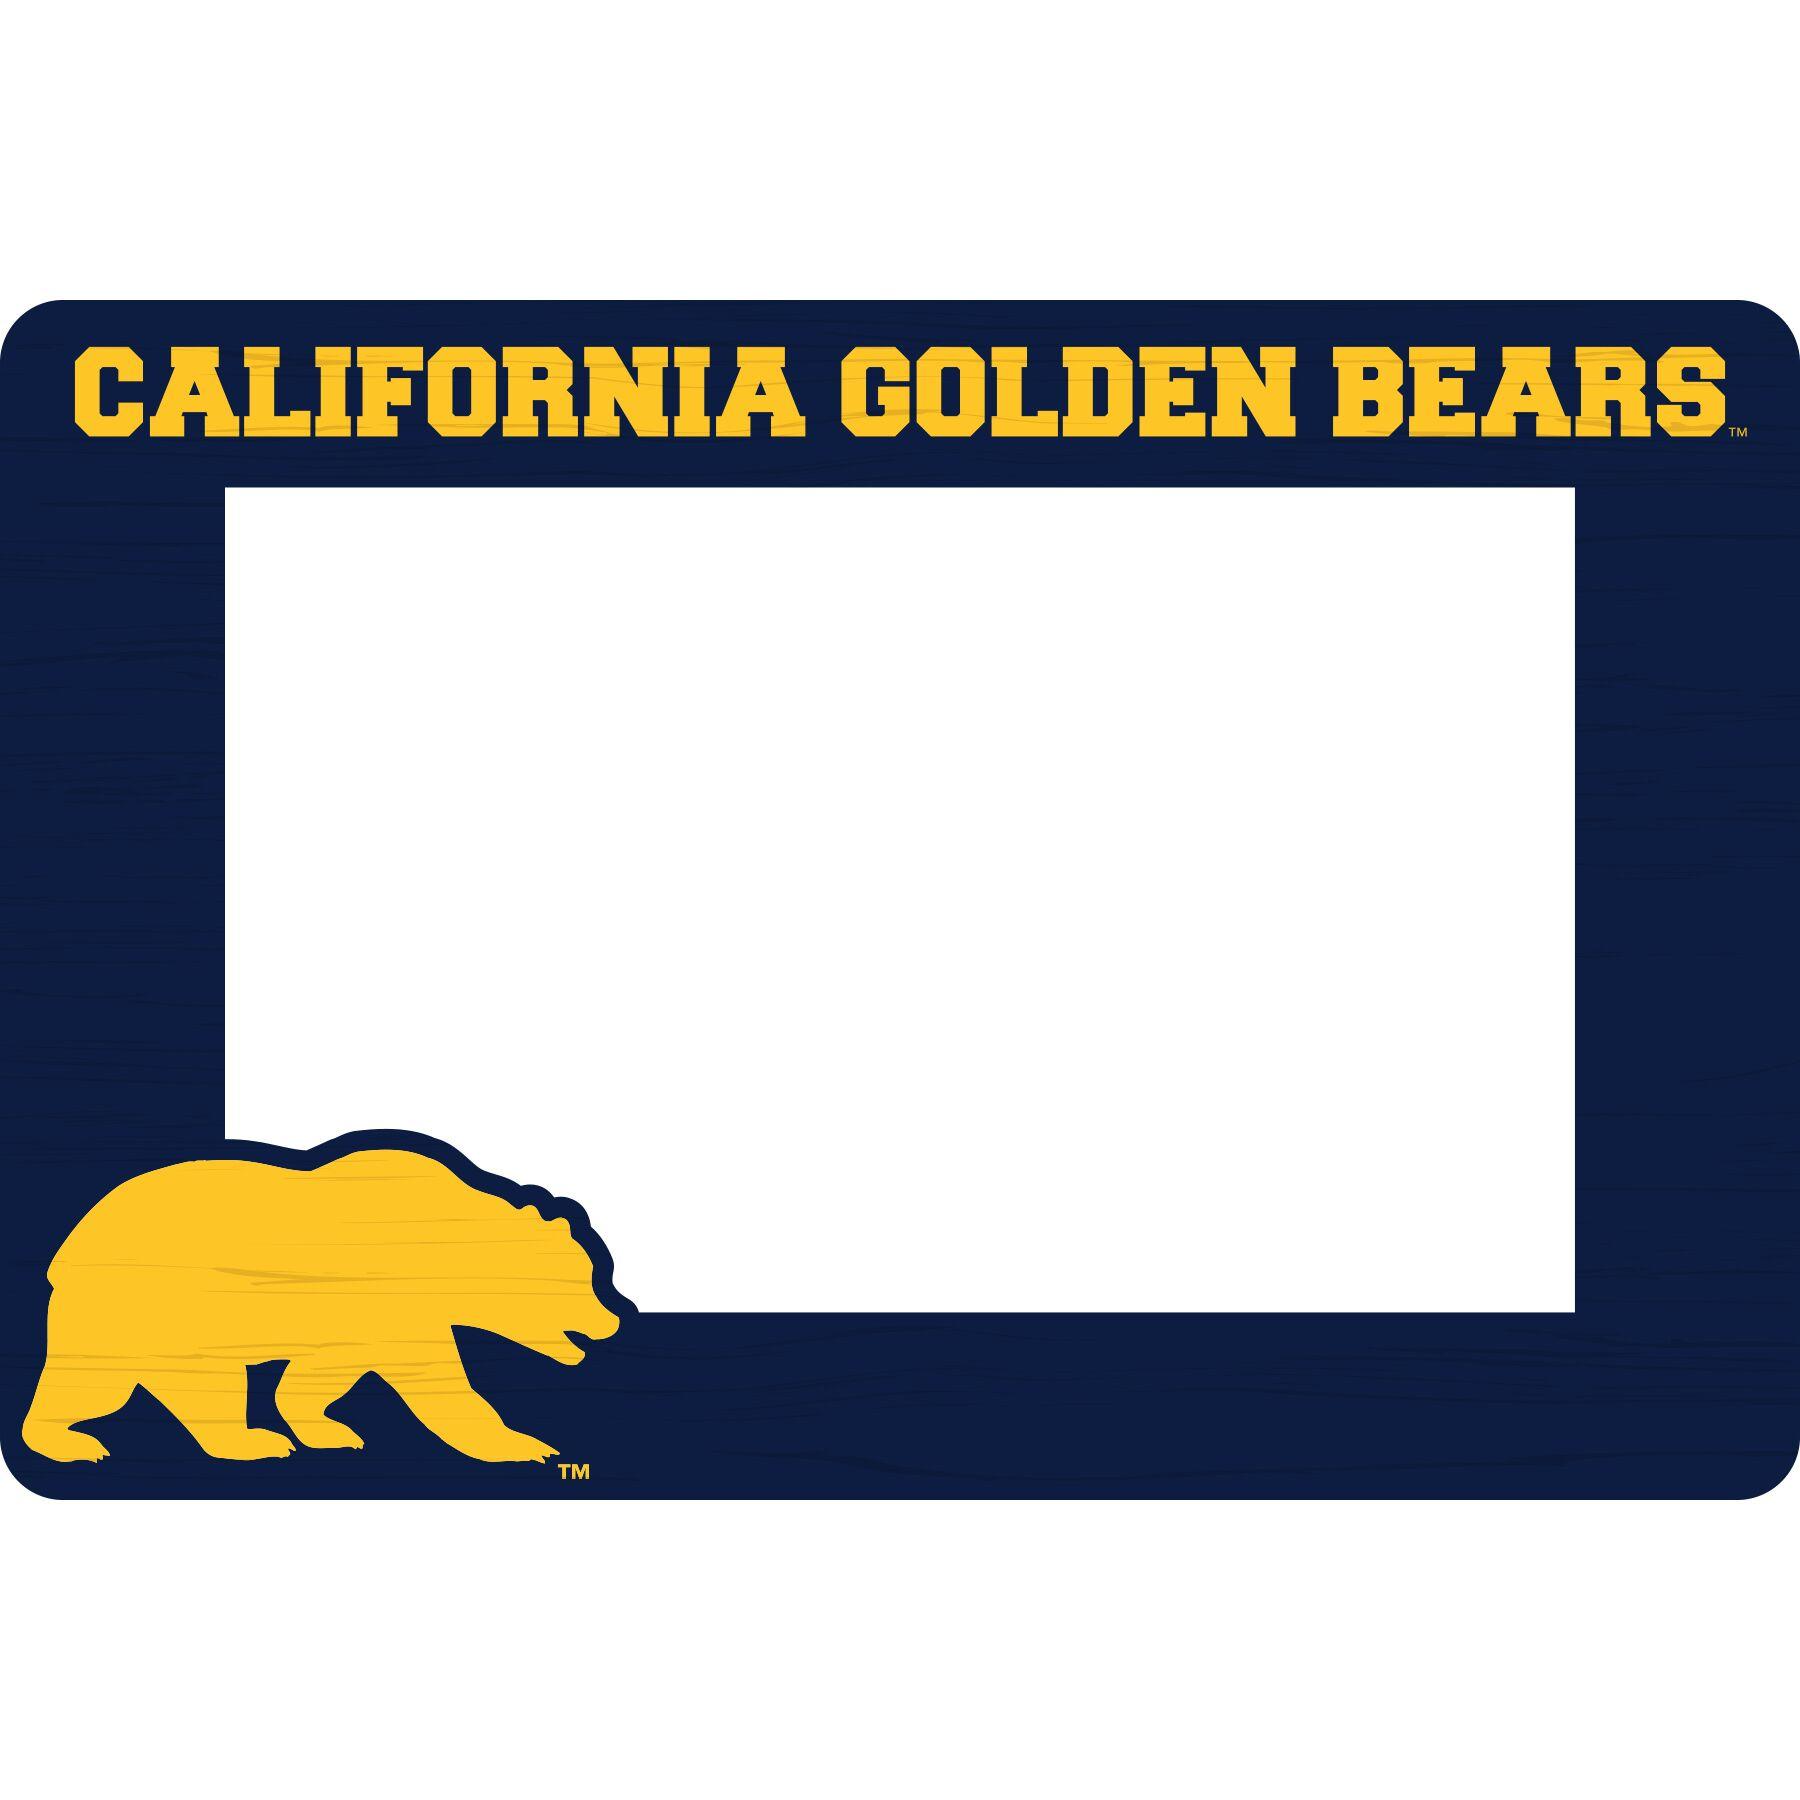 Cal Bears Recycled Wood Magnetic 4x6 Frame Horizontal